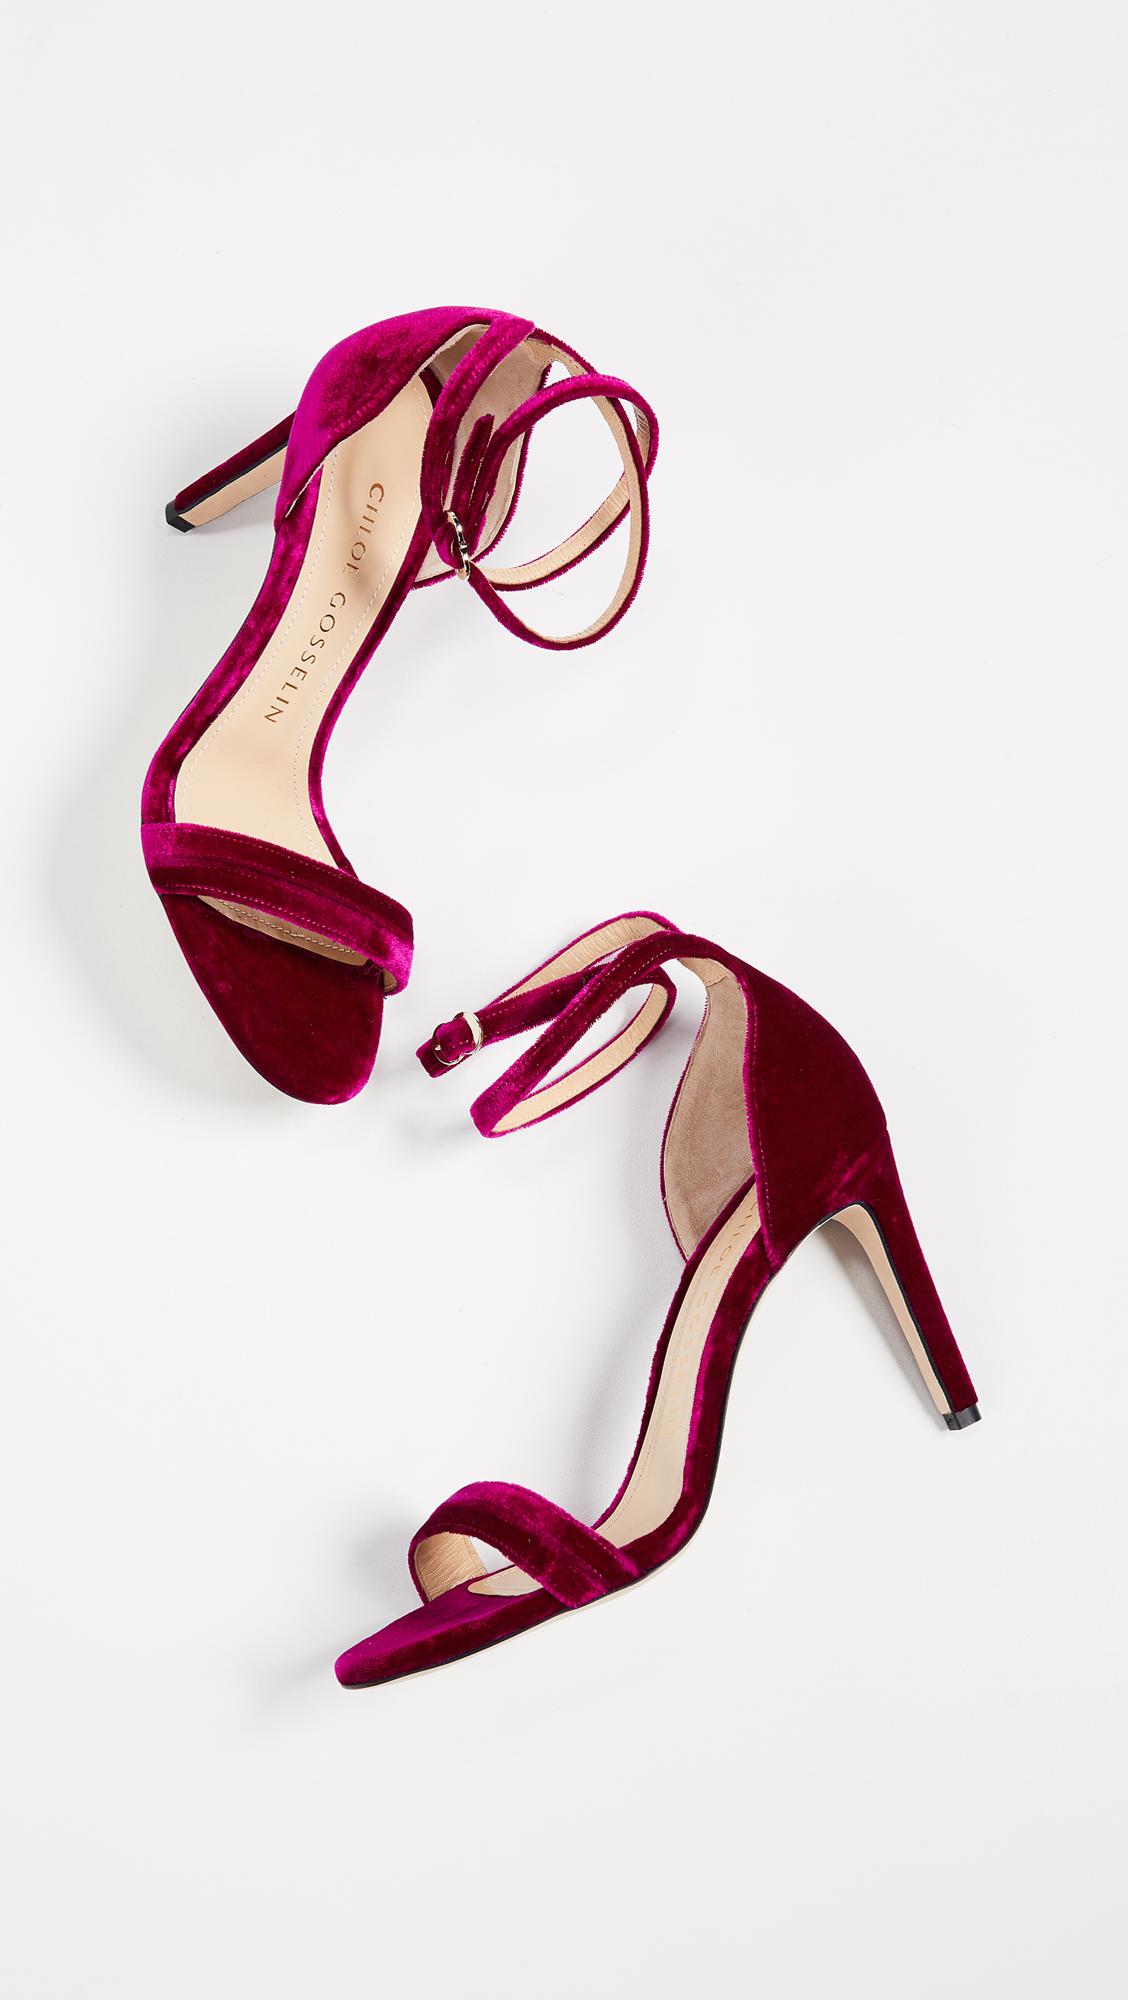 e9a67500f8e059 Chloe Gosselin Narcissus 90mm Sandals